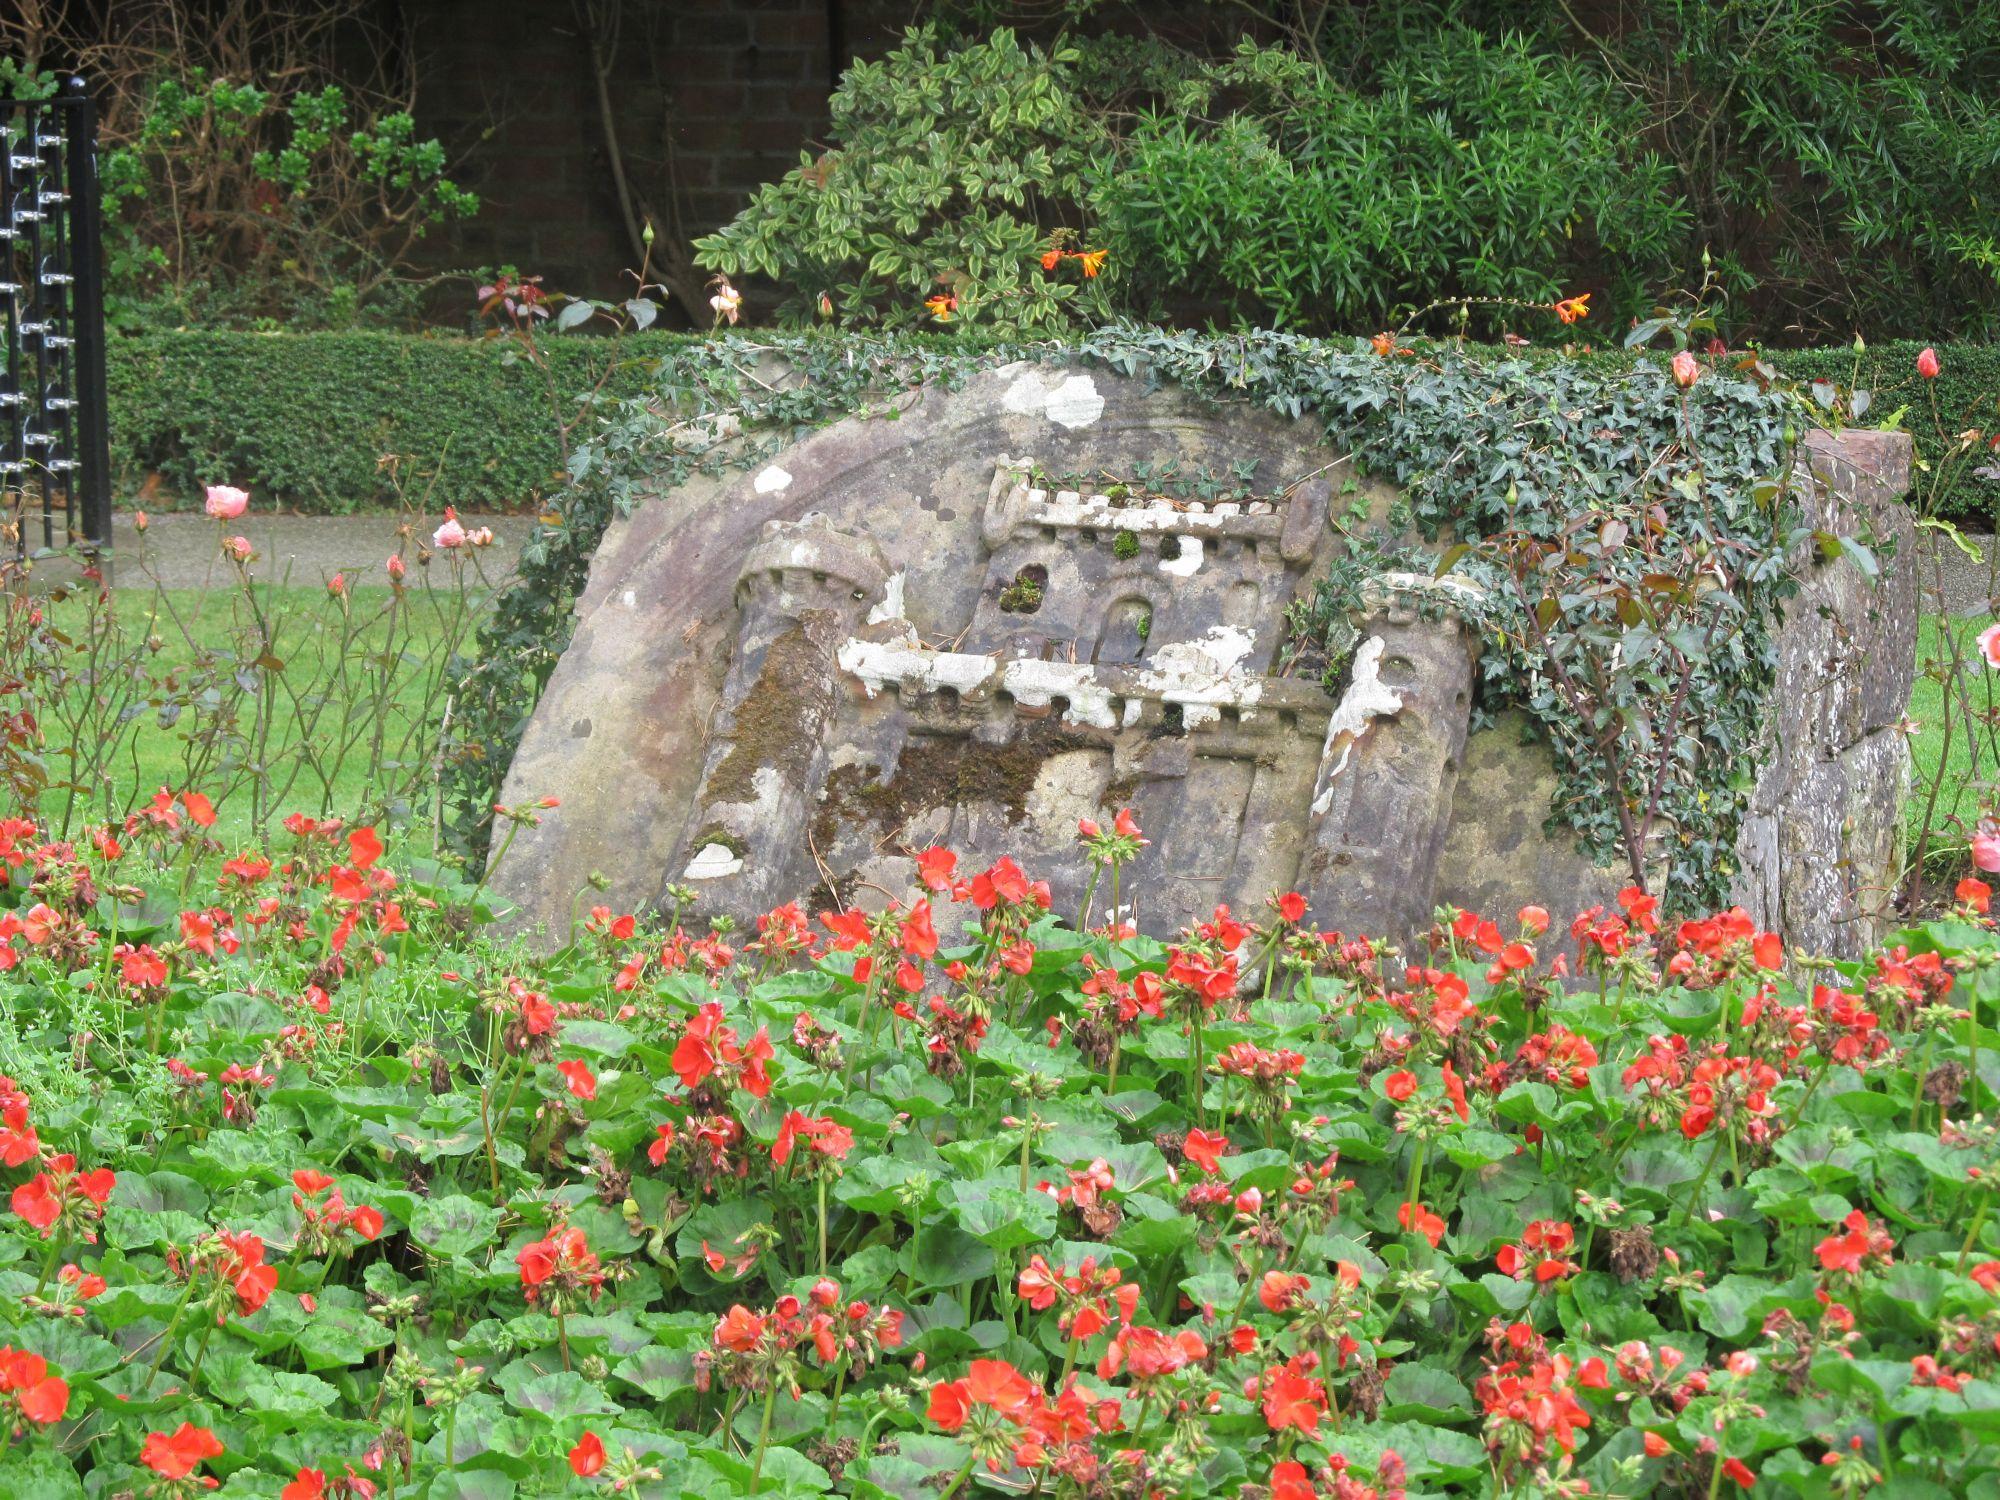 Rock of castle at Burns Park